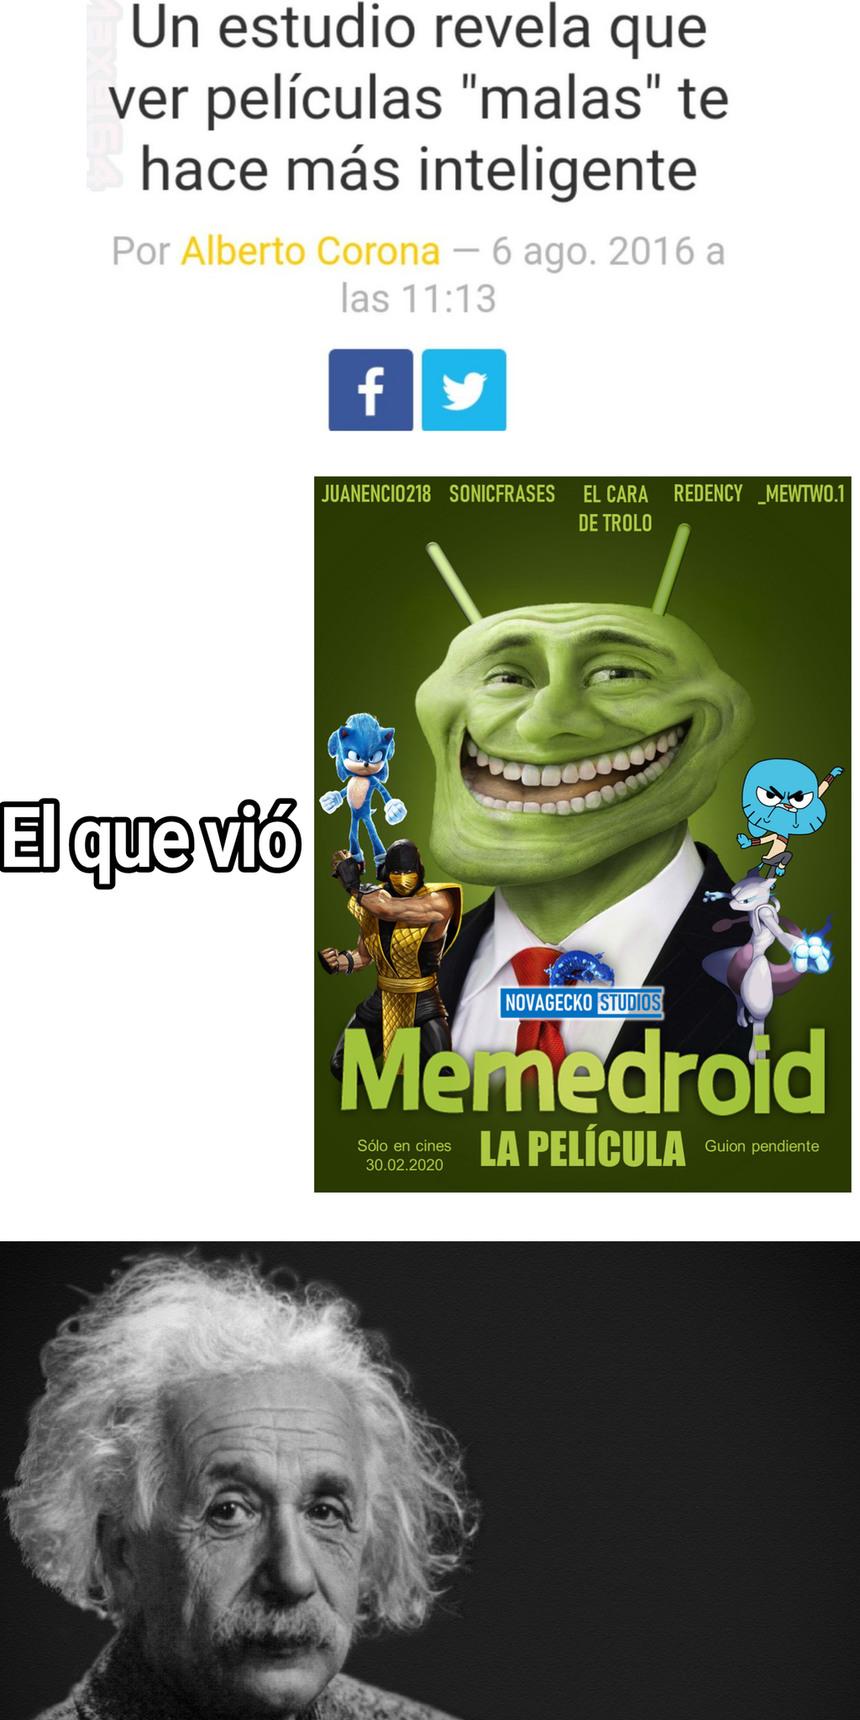 200iq - meme